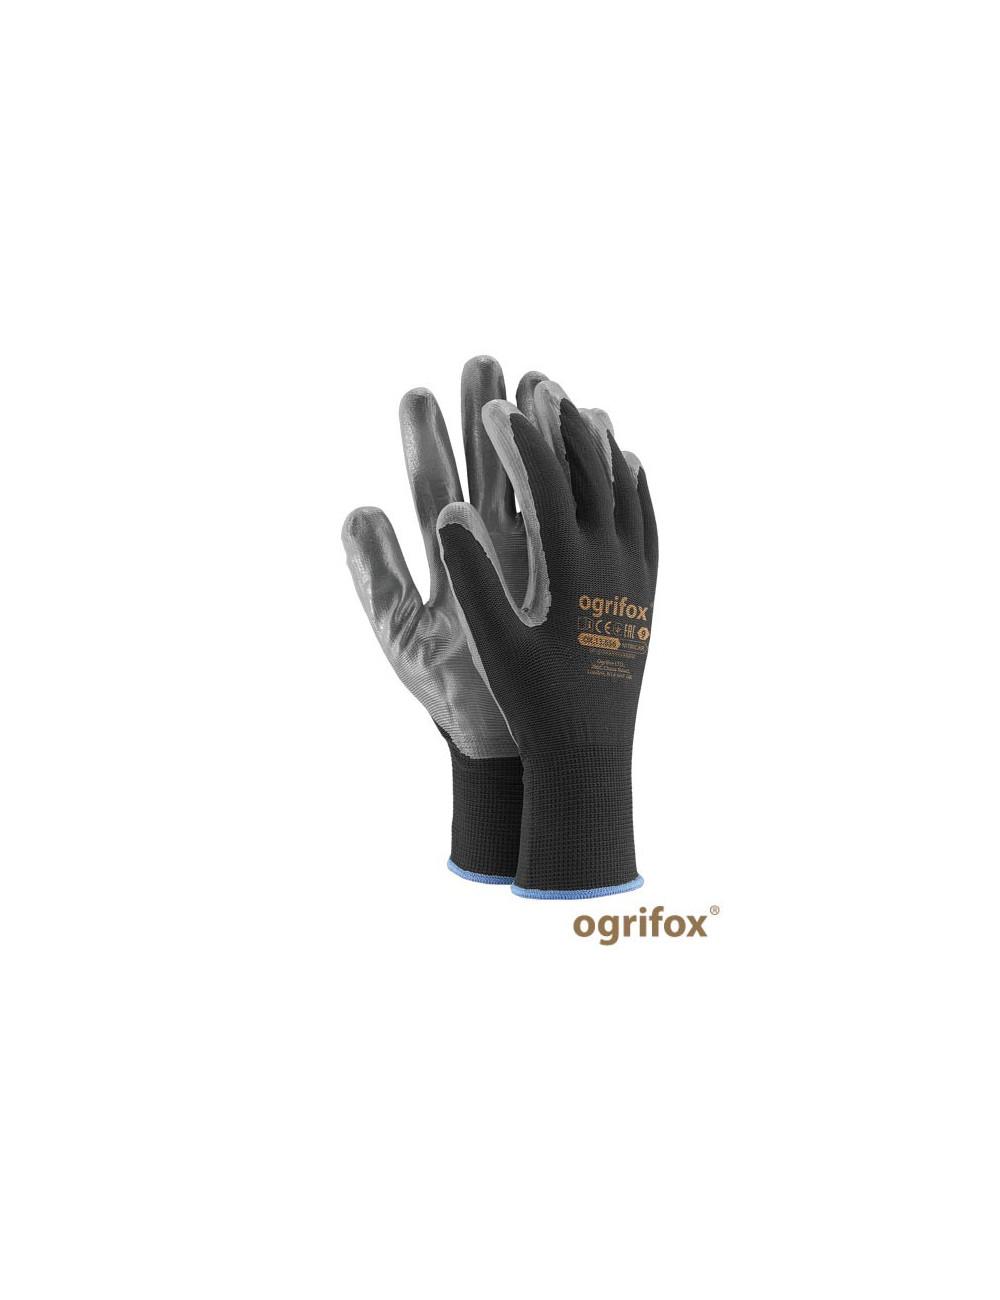 OGRIFOX RĘKAWICE OCHRONNE OX.13.656 NITRICAR OX-NITRICAR BS CZARNO-SZARY